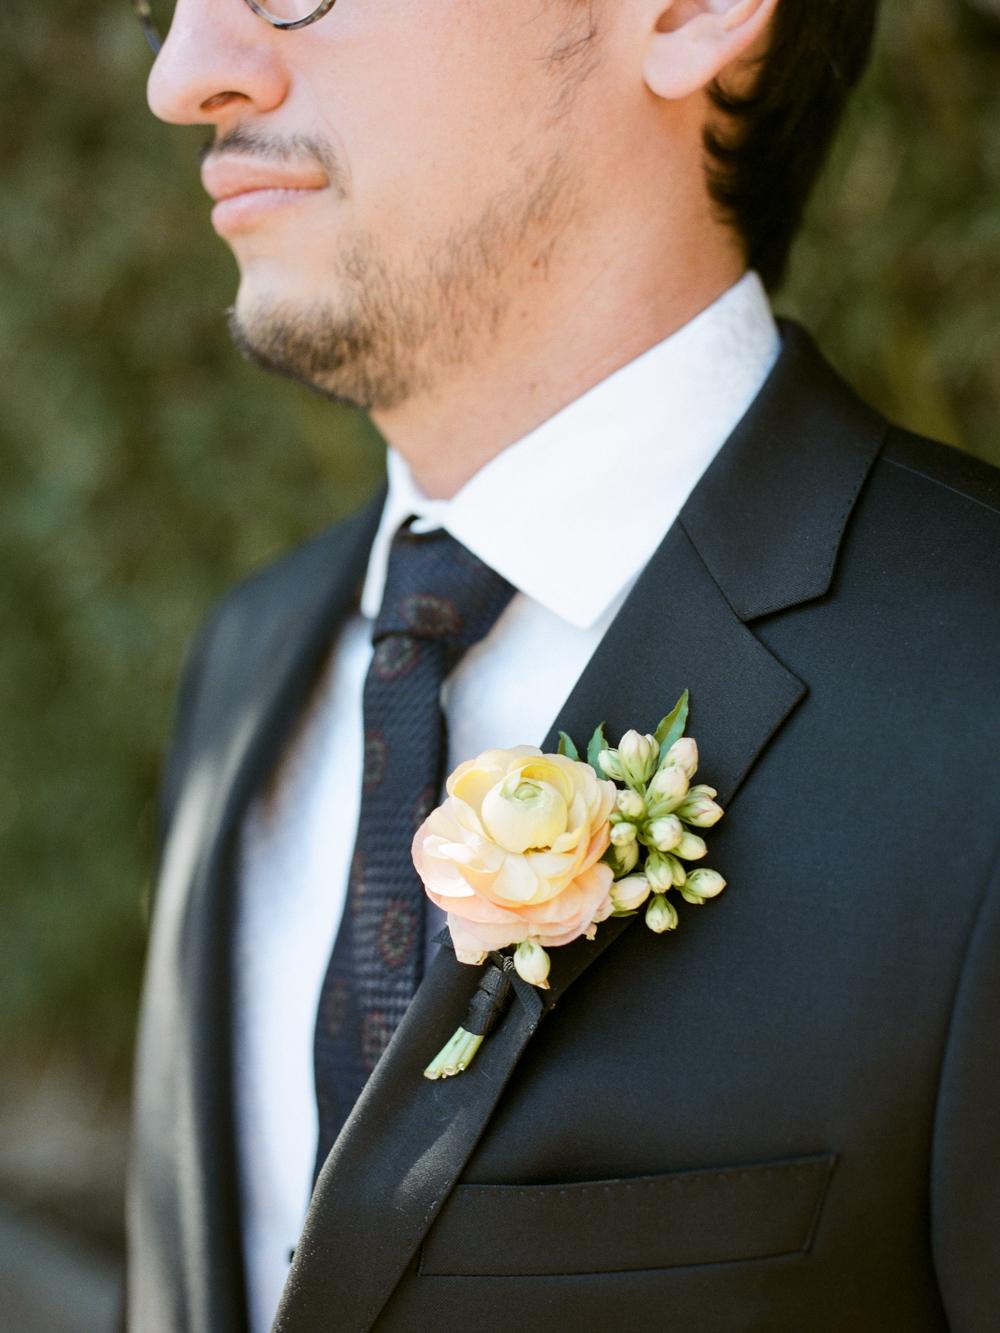 fall wedding at rothko chapel- houston wedding photographer-christine gosch - film photographer - elopement photographer- intimate wedding - lovely bride wedding gown-14.jpg